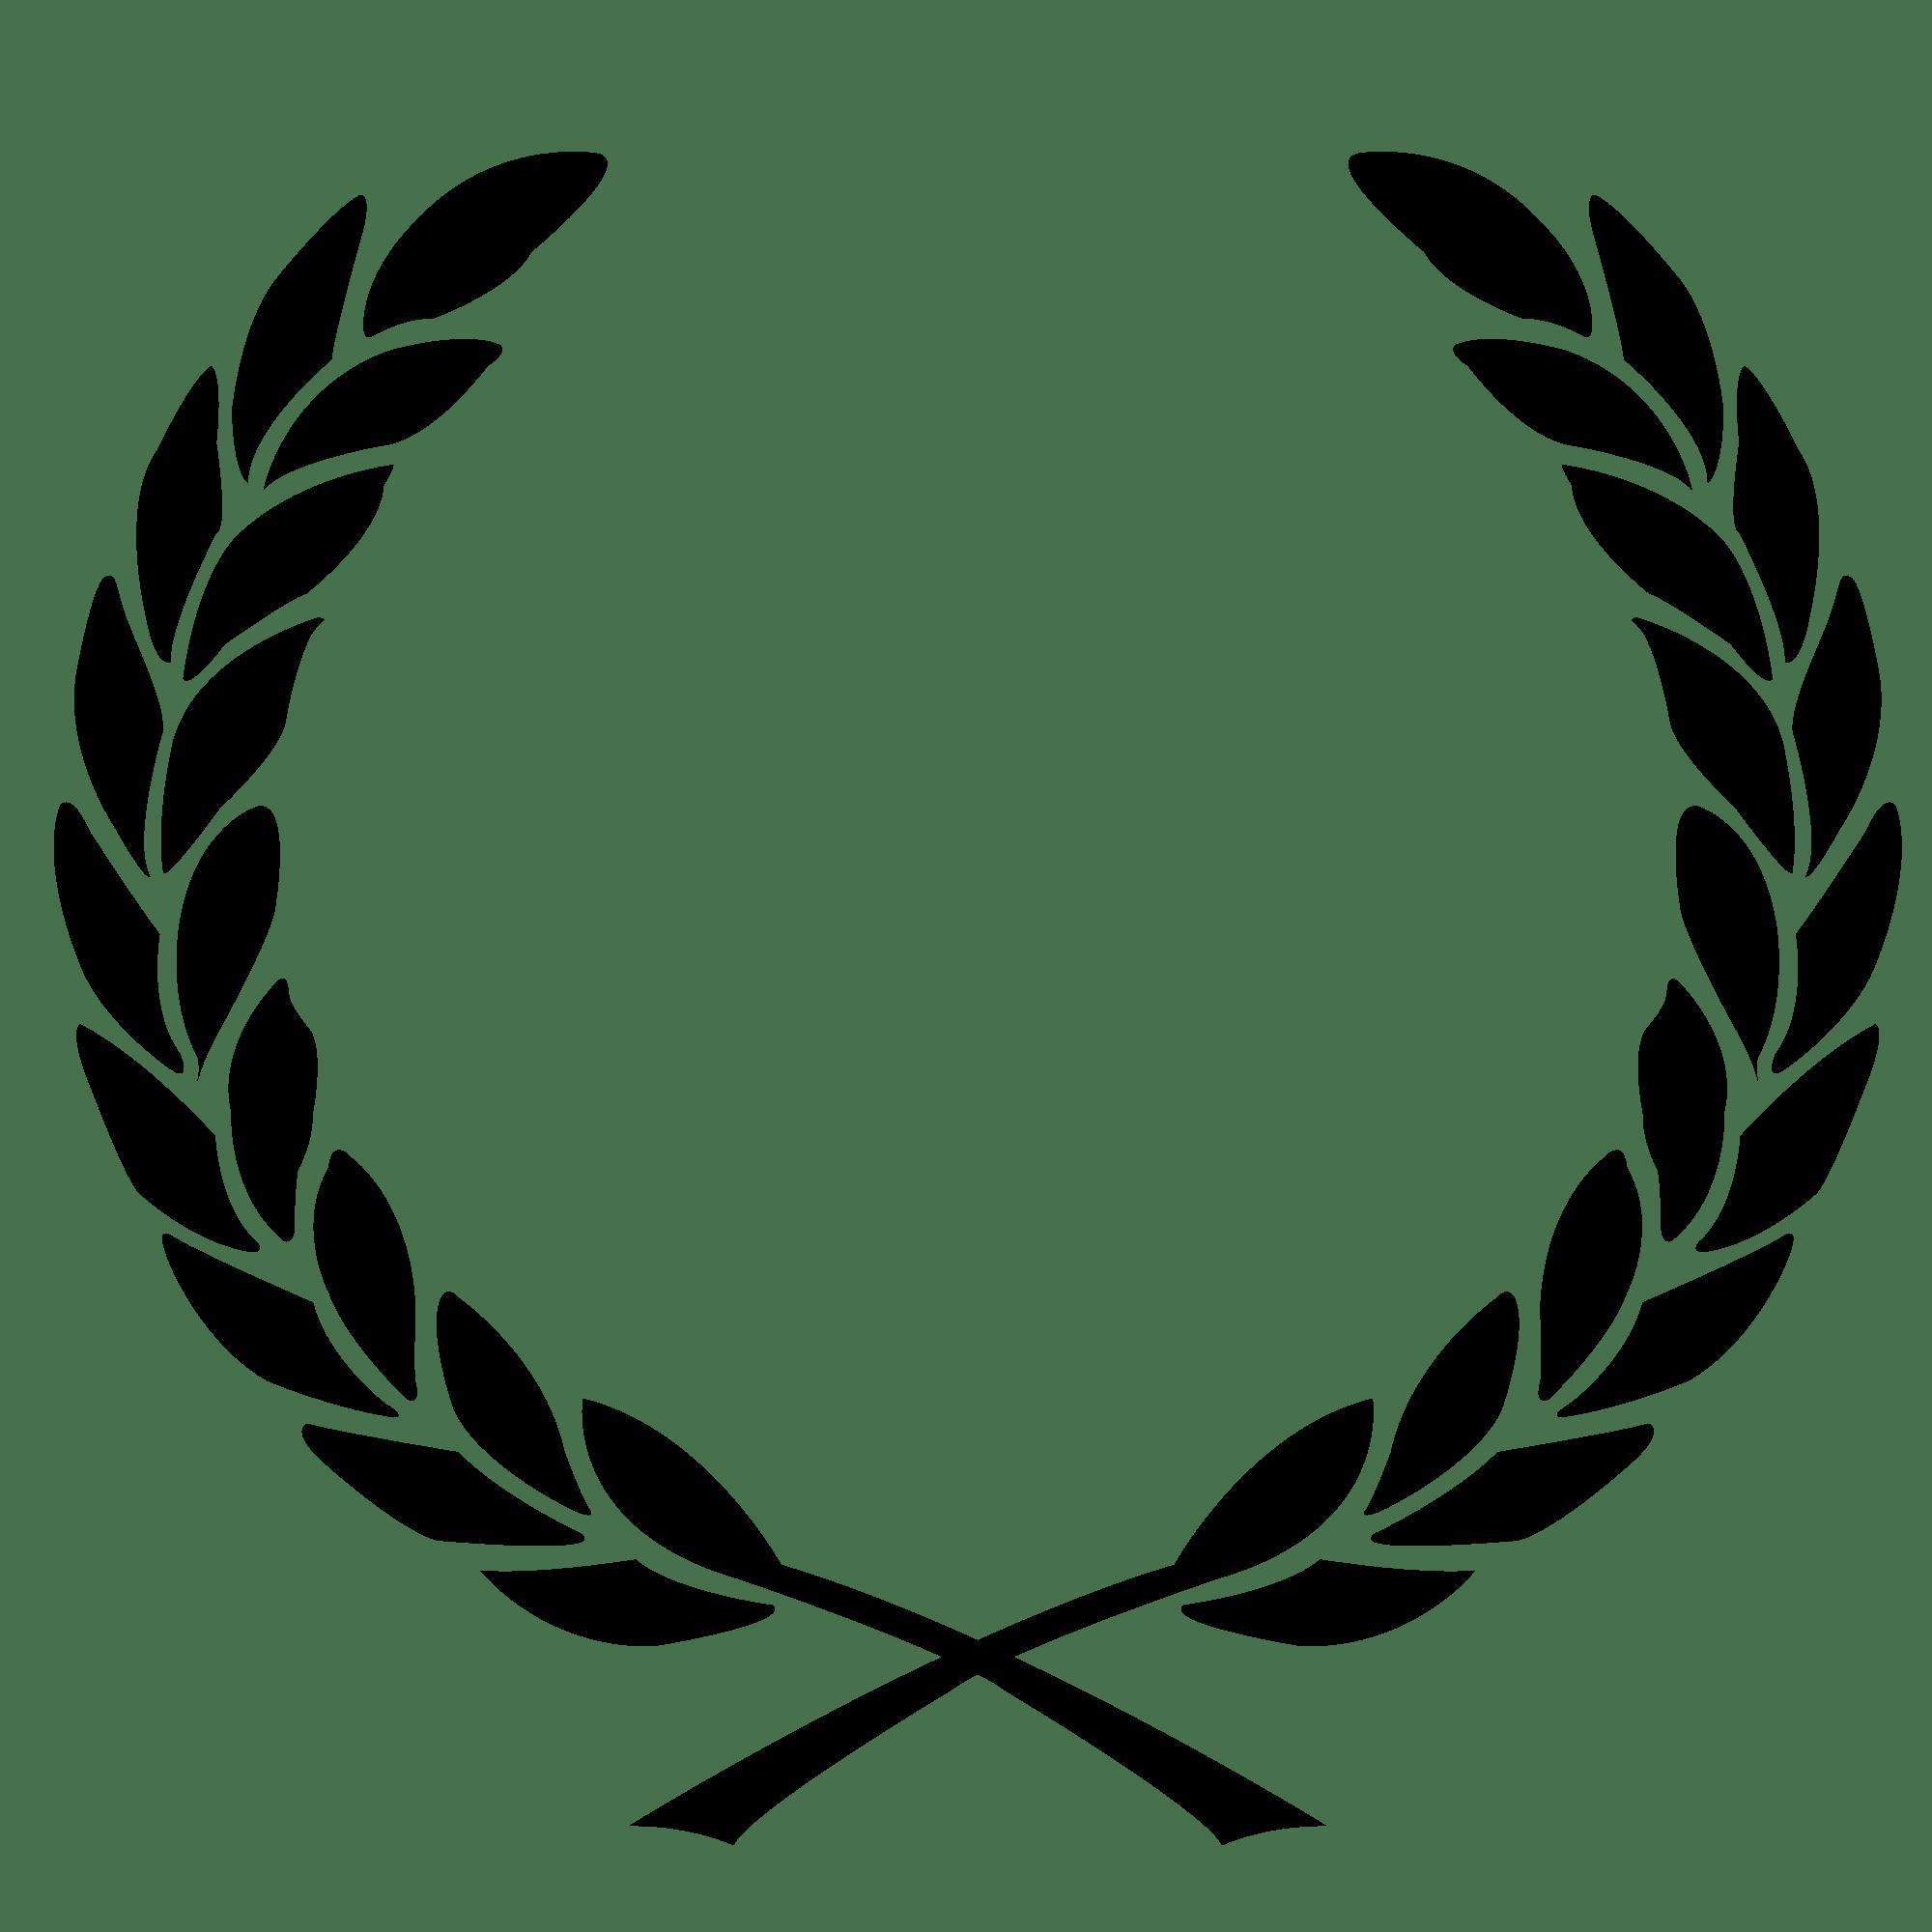 Justice Clipart Laurel Leaves Justice Laurel Leaves